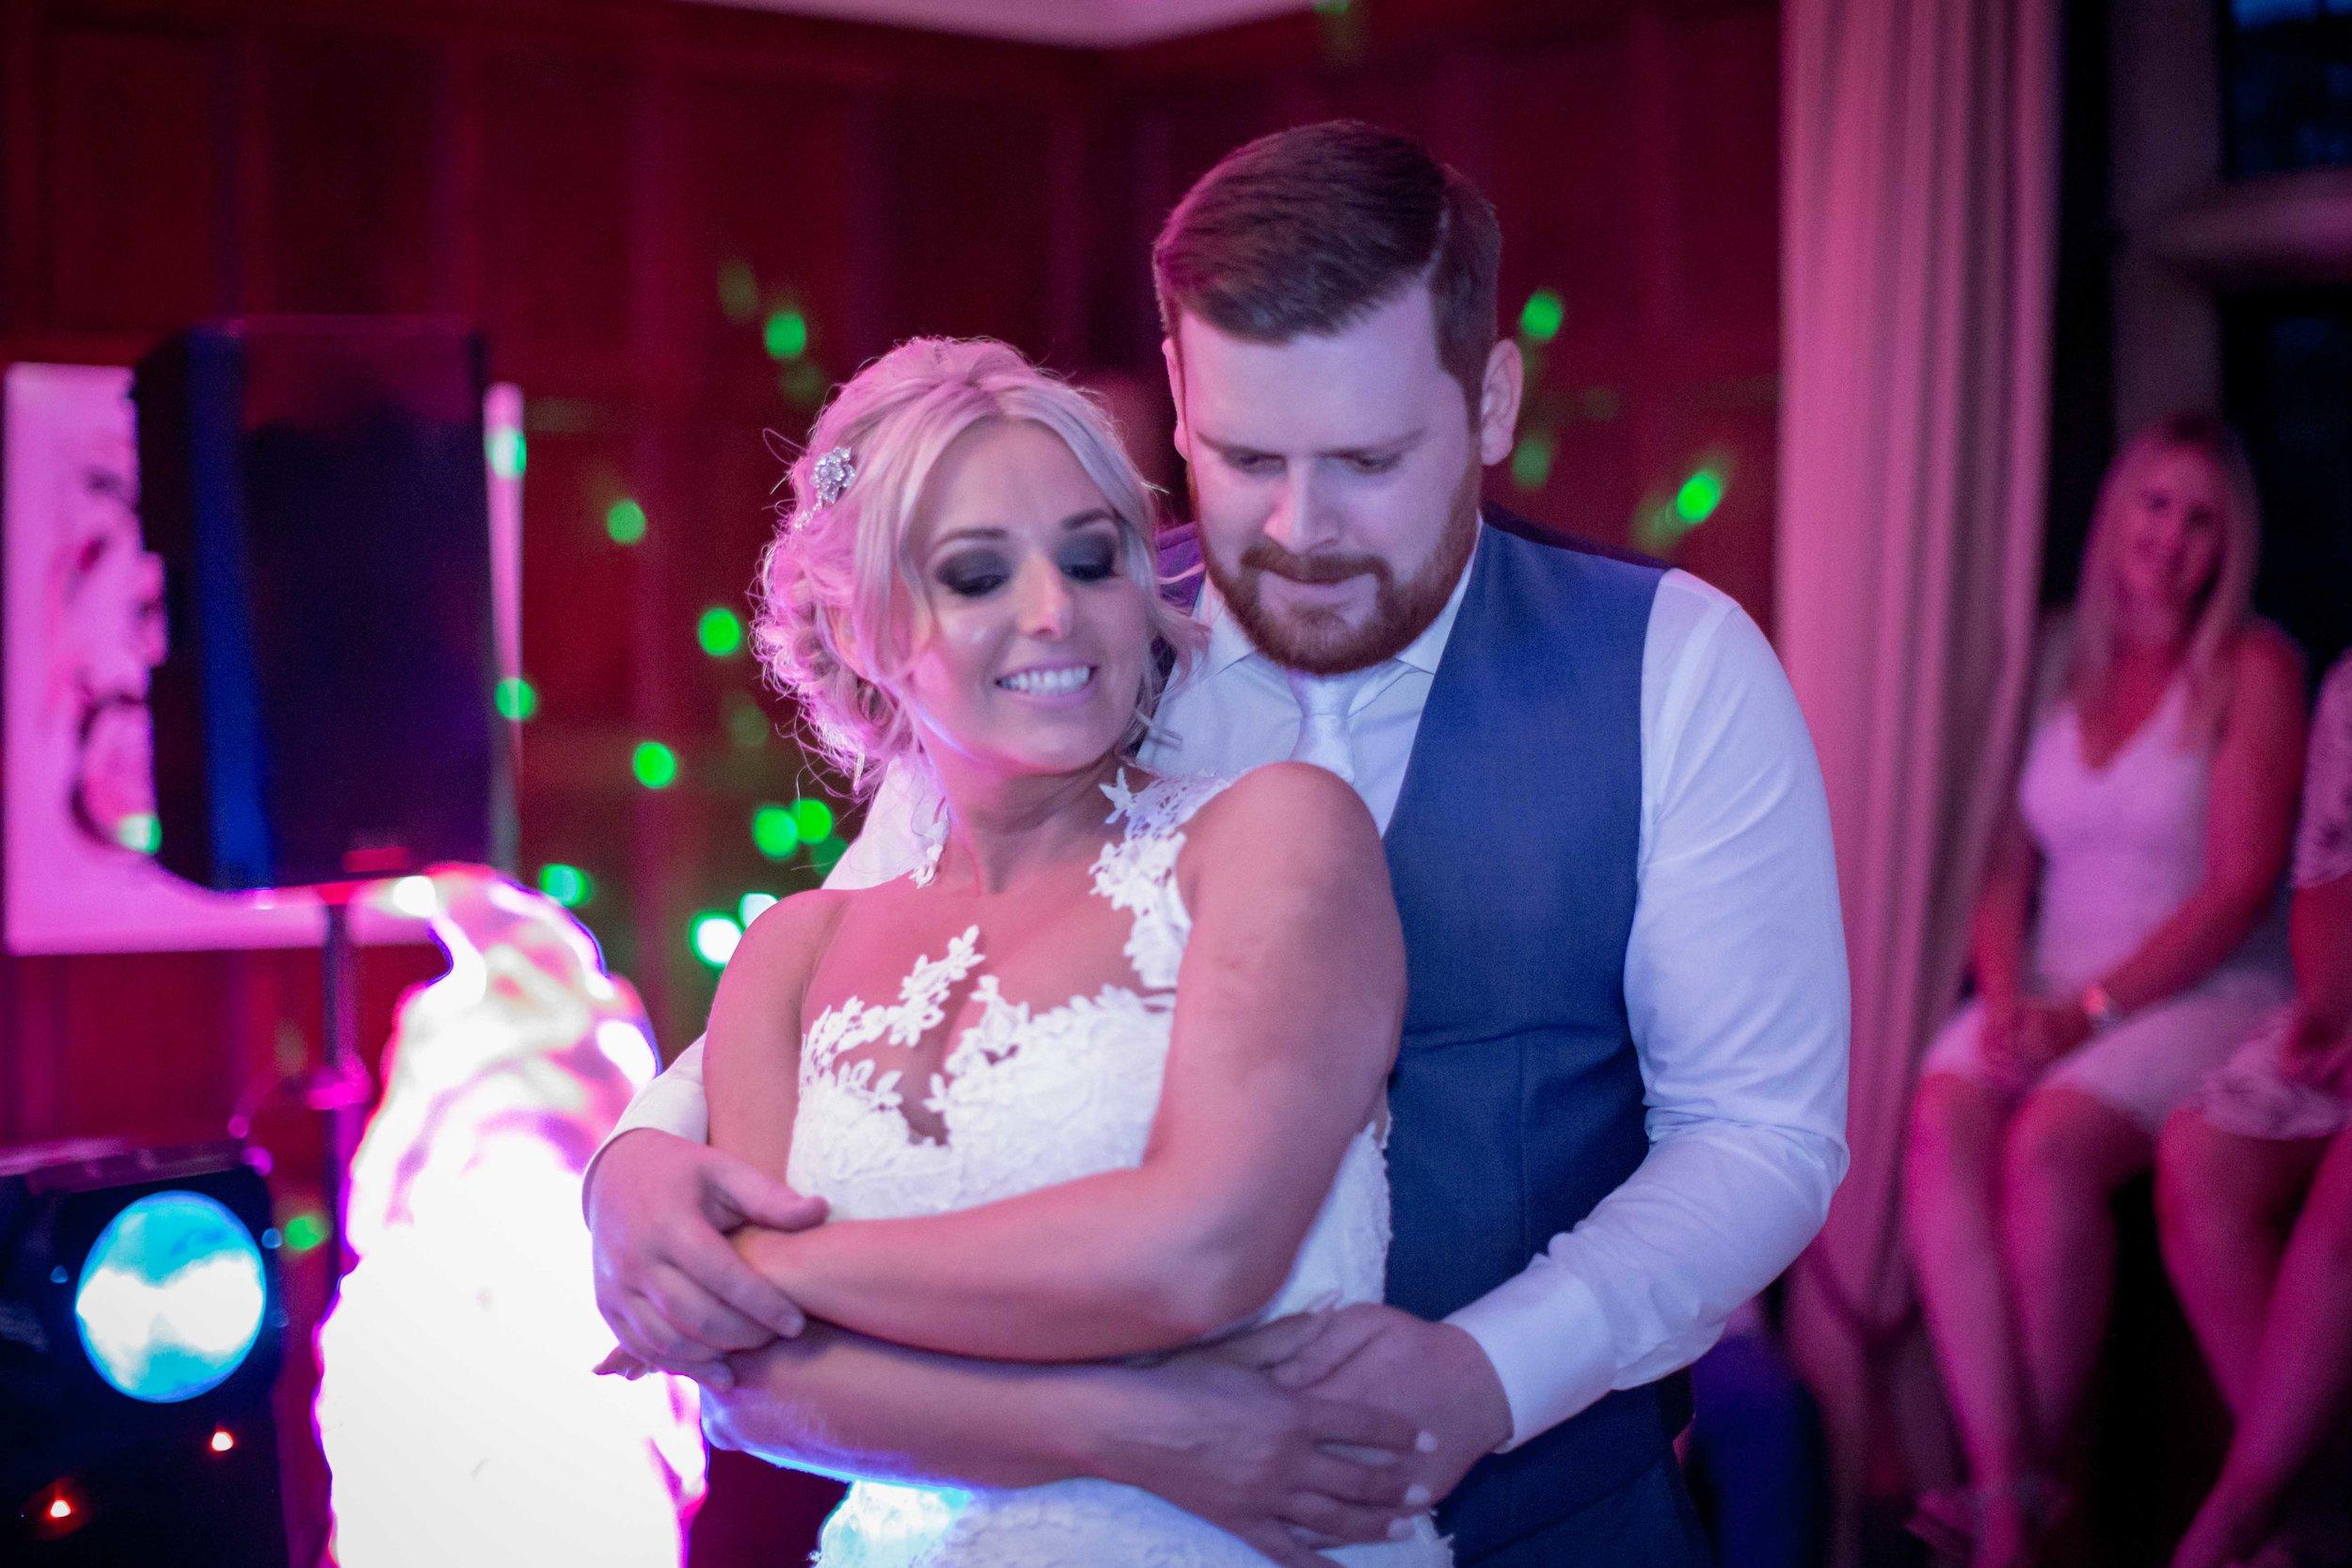 cotswold-wedding-photography-at-stonehouse-court-hotel-natalia-smith-photography-gloucestershire-wedding-photographer-89.jpg